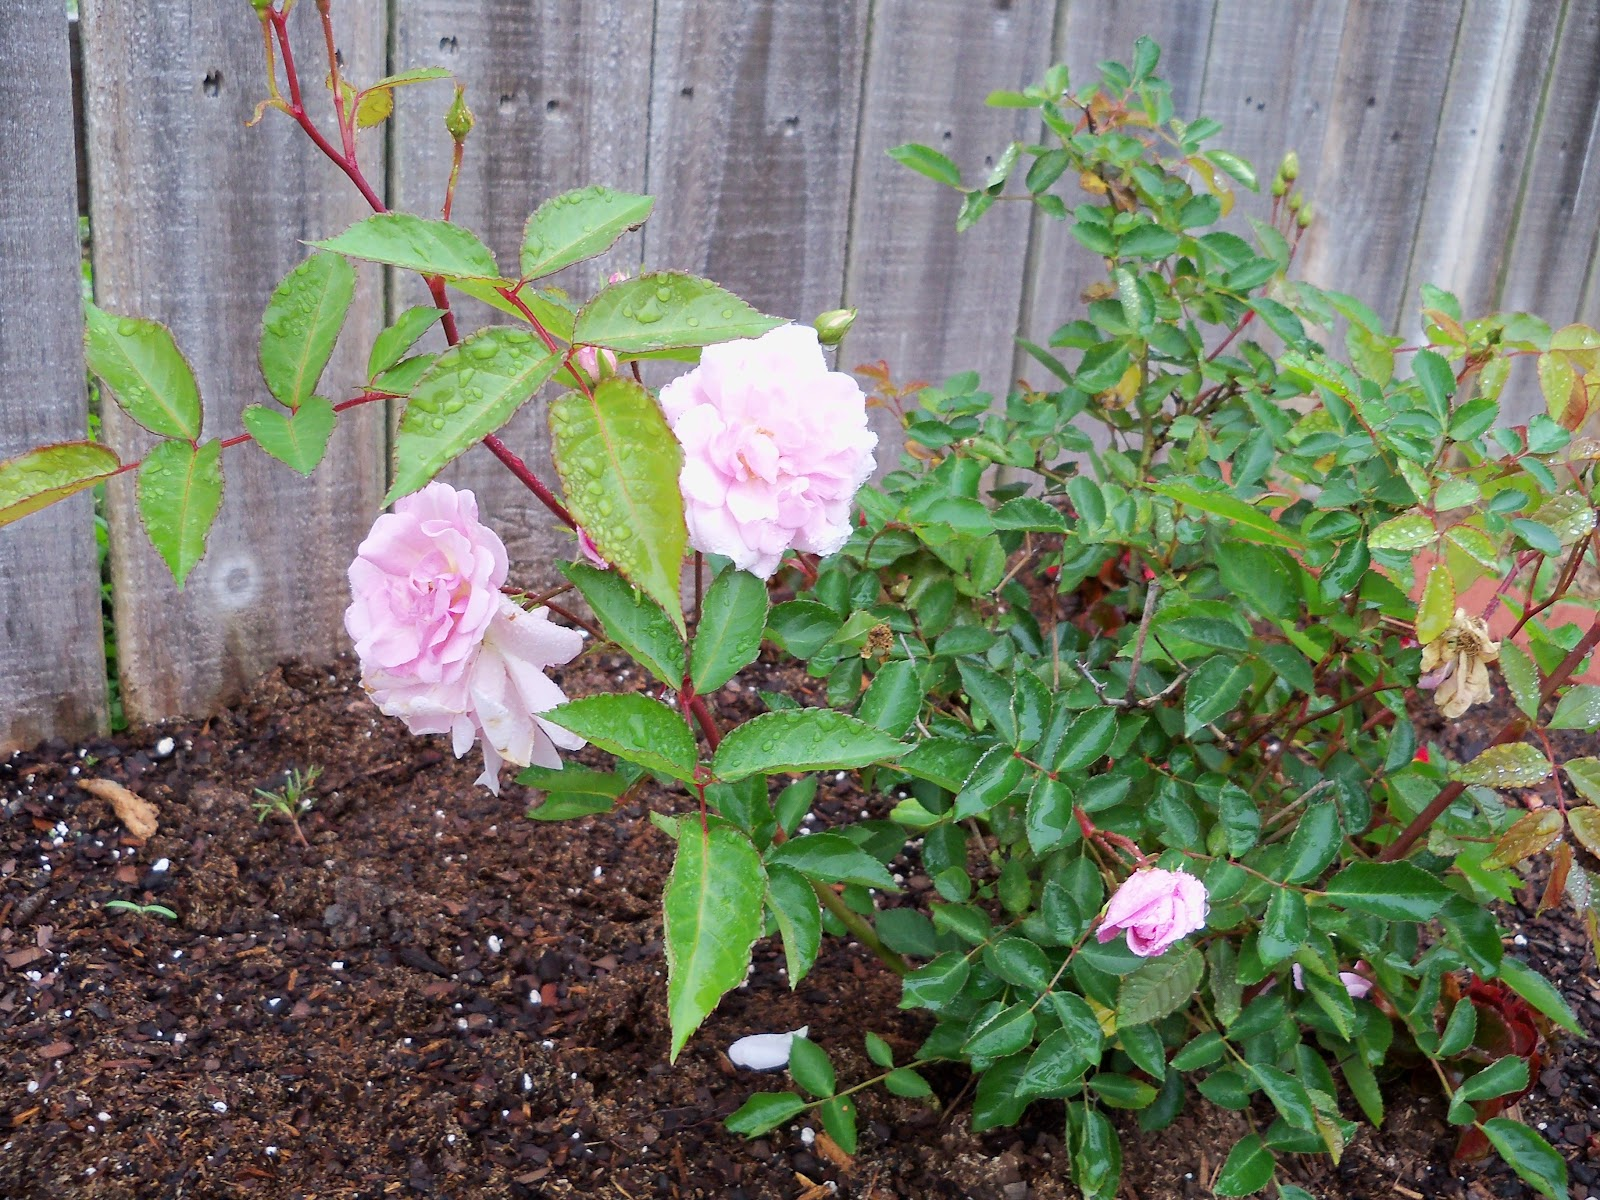 Gardening 2010 - 101_0644.JPG